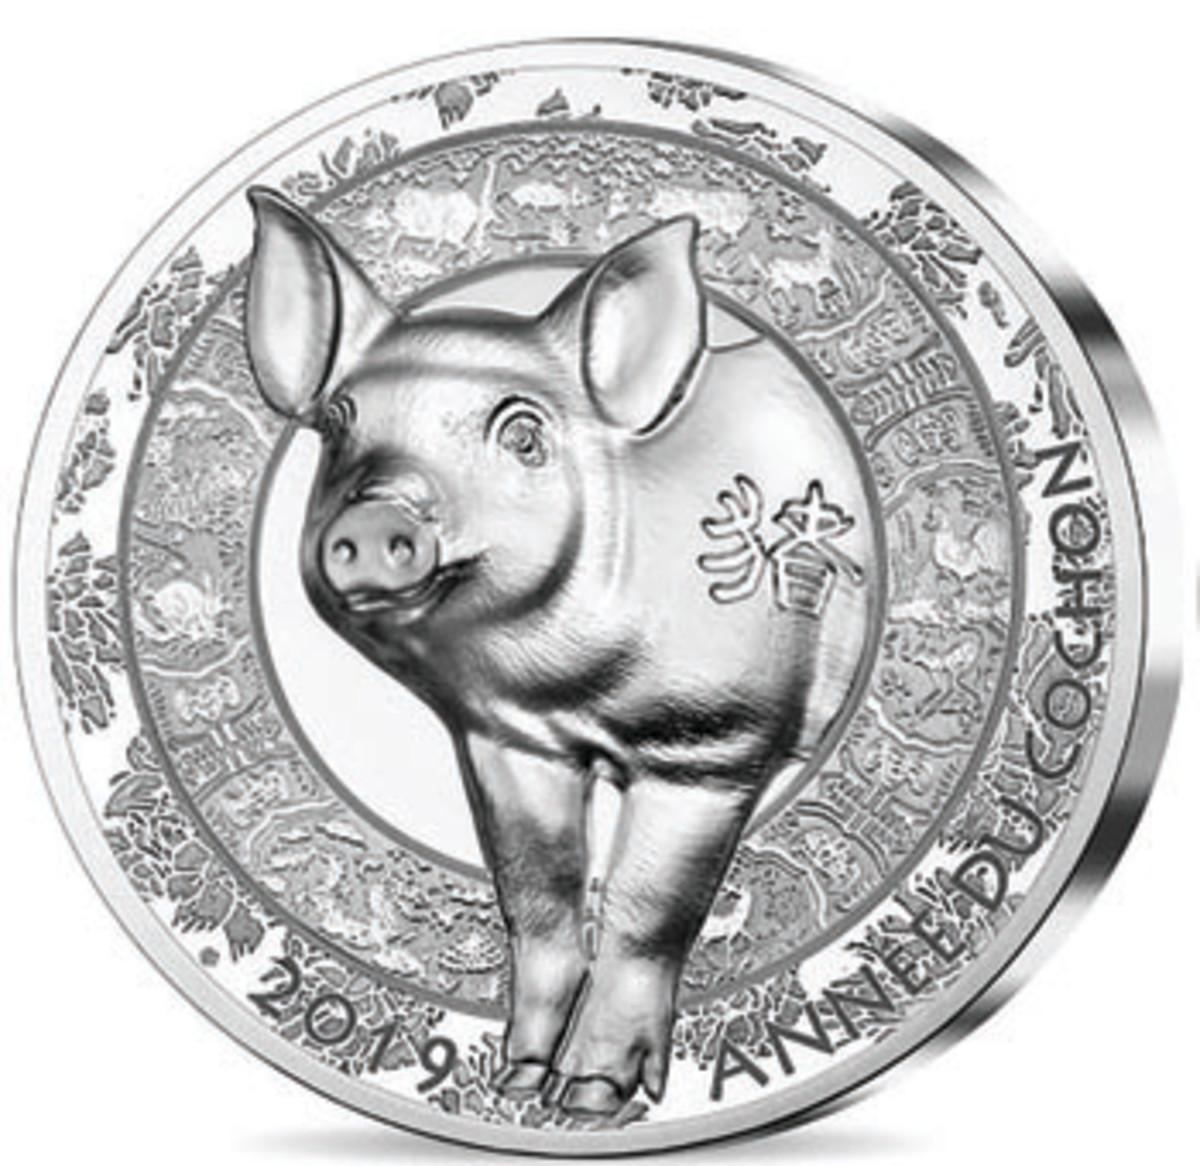 Monnaie de Paris marks Année du Cochon with an enthusiastic pig leaping headlong from the reverse of an ultra-high relief silver s 20 euro. (Image courtesy Monnaie de Paris)